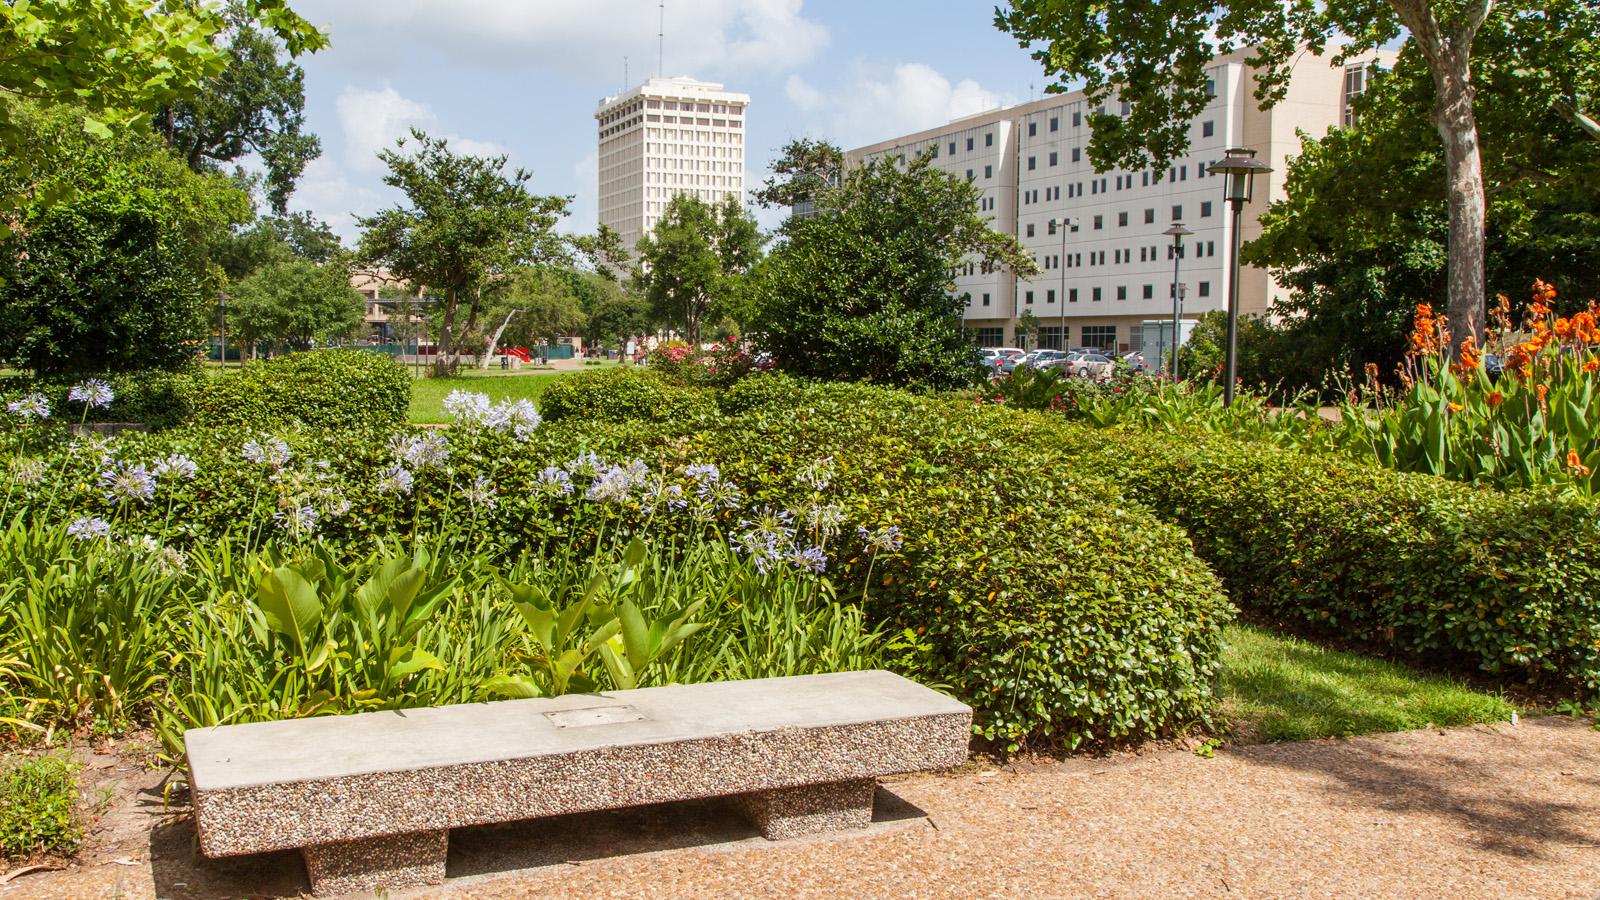 TX_Houston_UniversityofHouston_signature_BarrettDoherty_2014_02.jpg